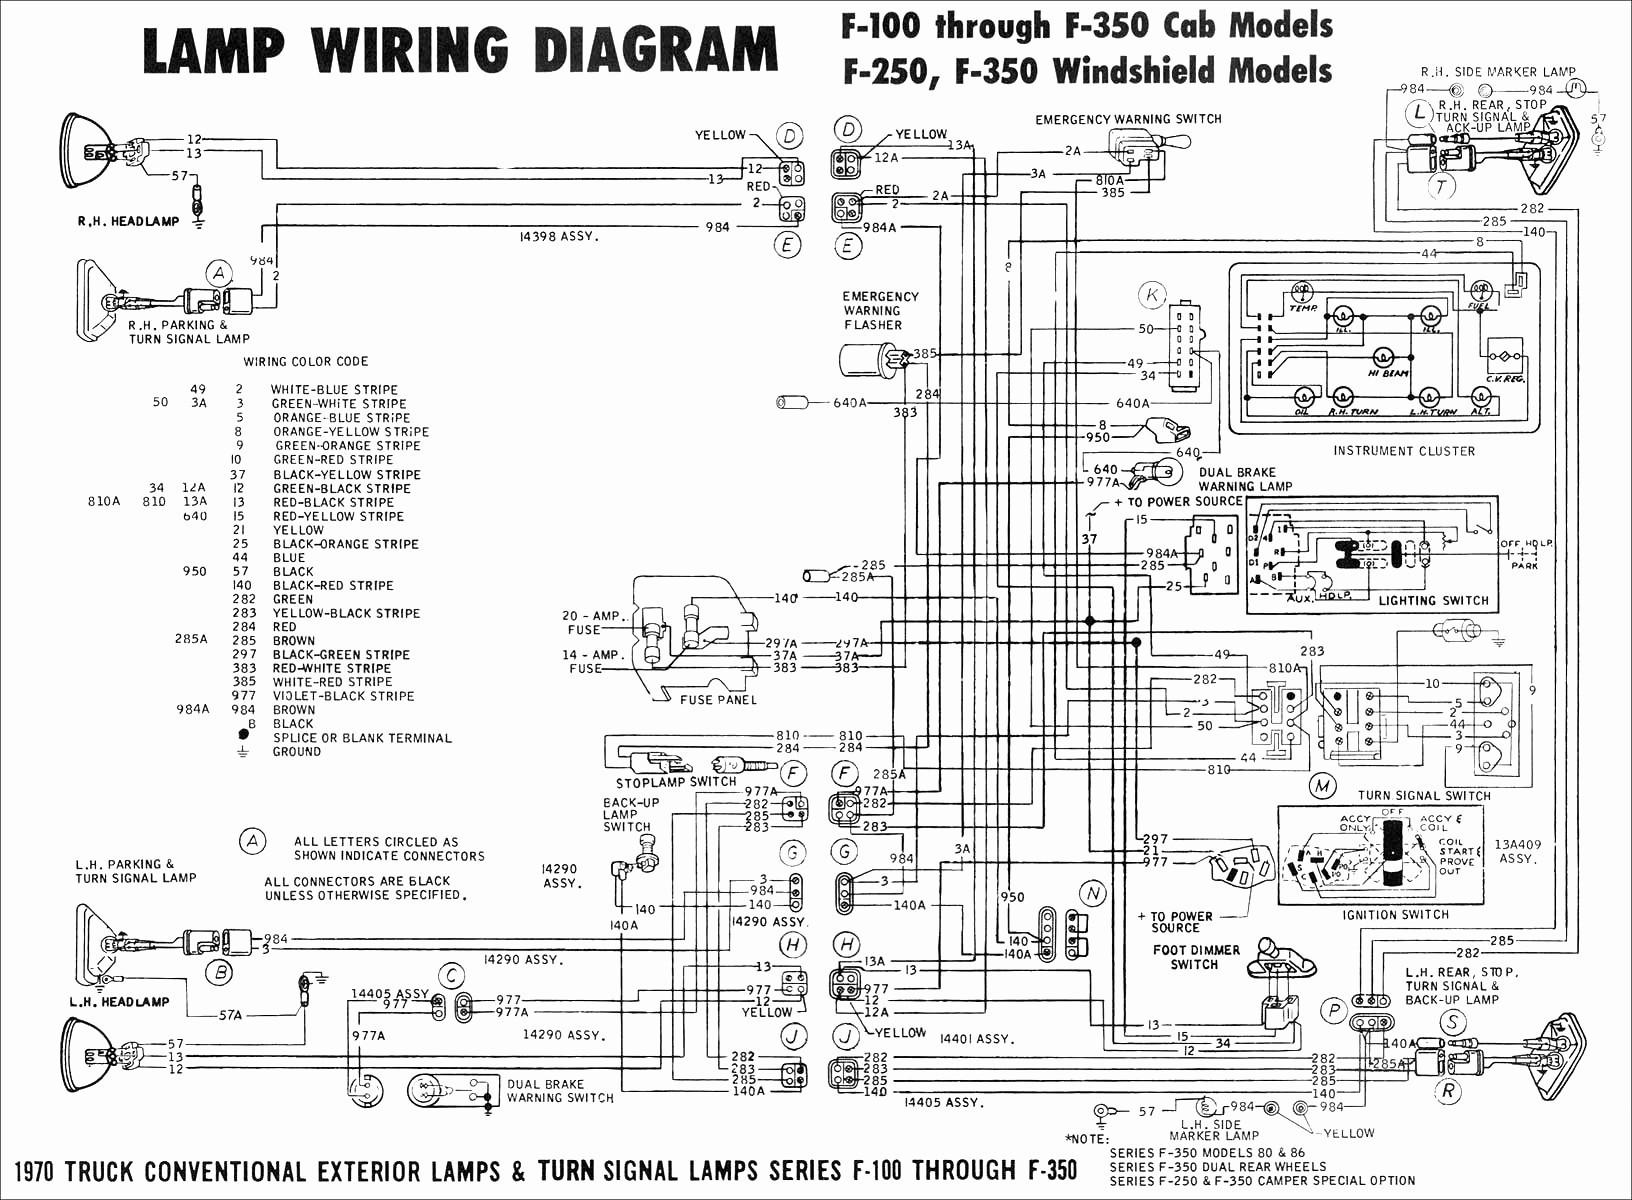 Bmw 318i Engine Diagram Bmw M60 Engine Wiring Harness Diagram Likewise Bmw M60 Engine Of Bmw 318i Engine Diagram